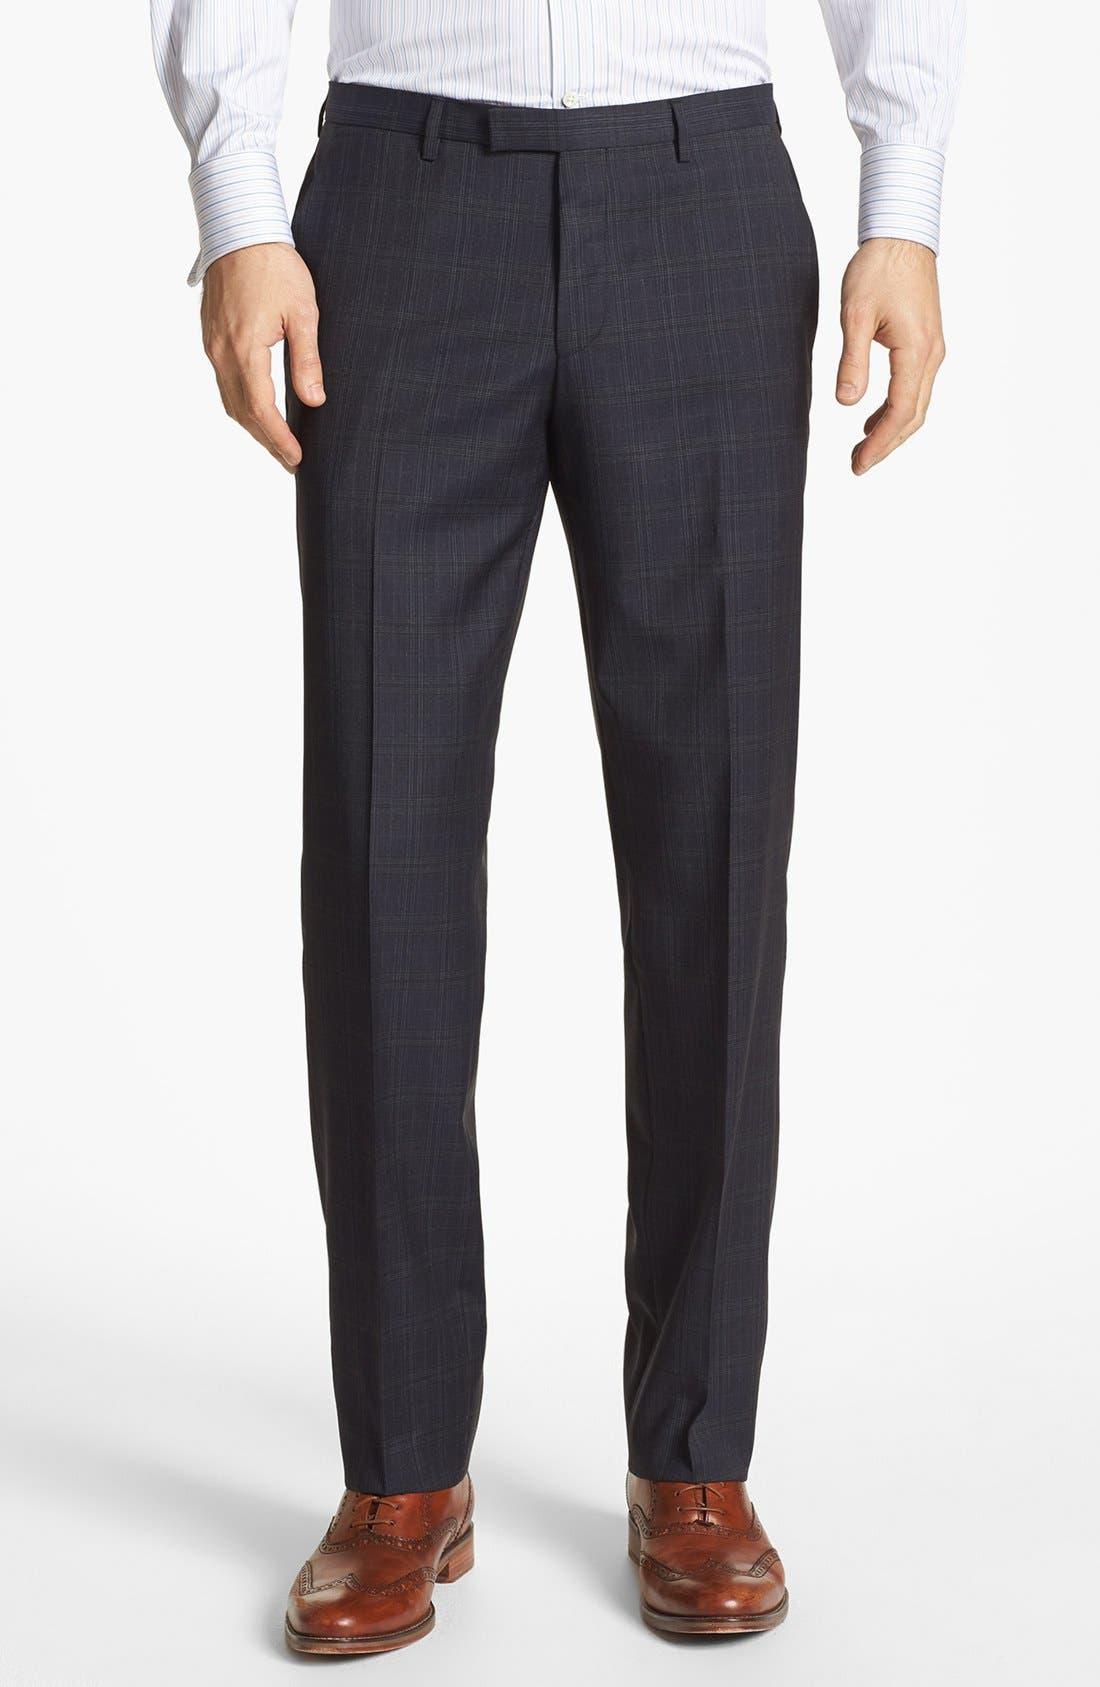 Main Image - BOSS HUGO BOSS 'Sharp' Flat Front Trousers